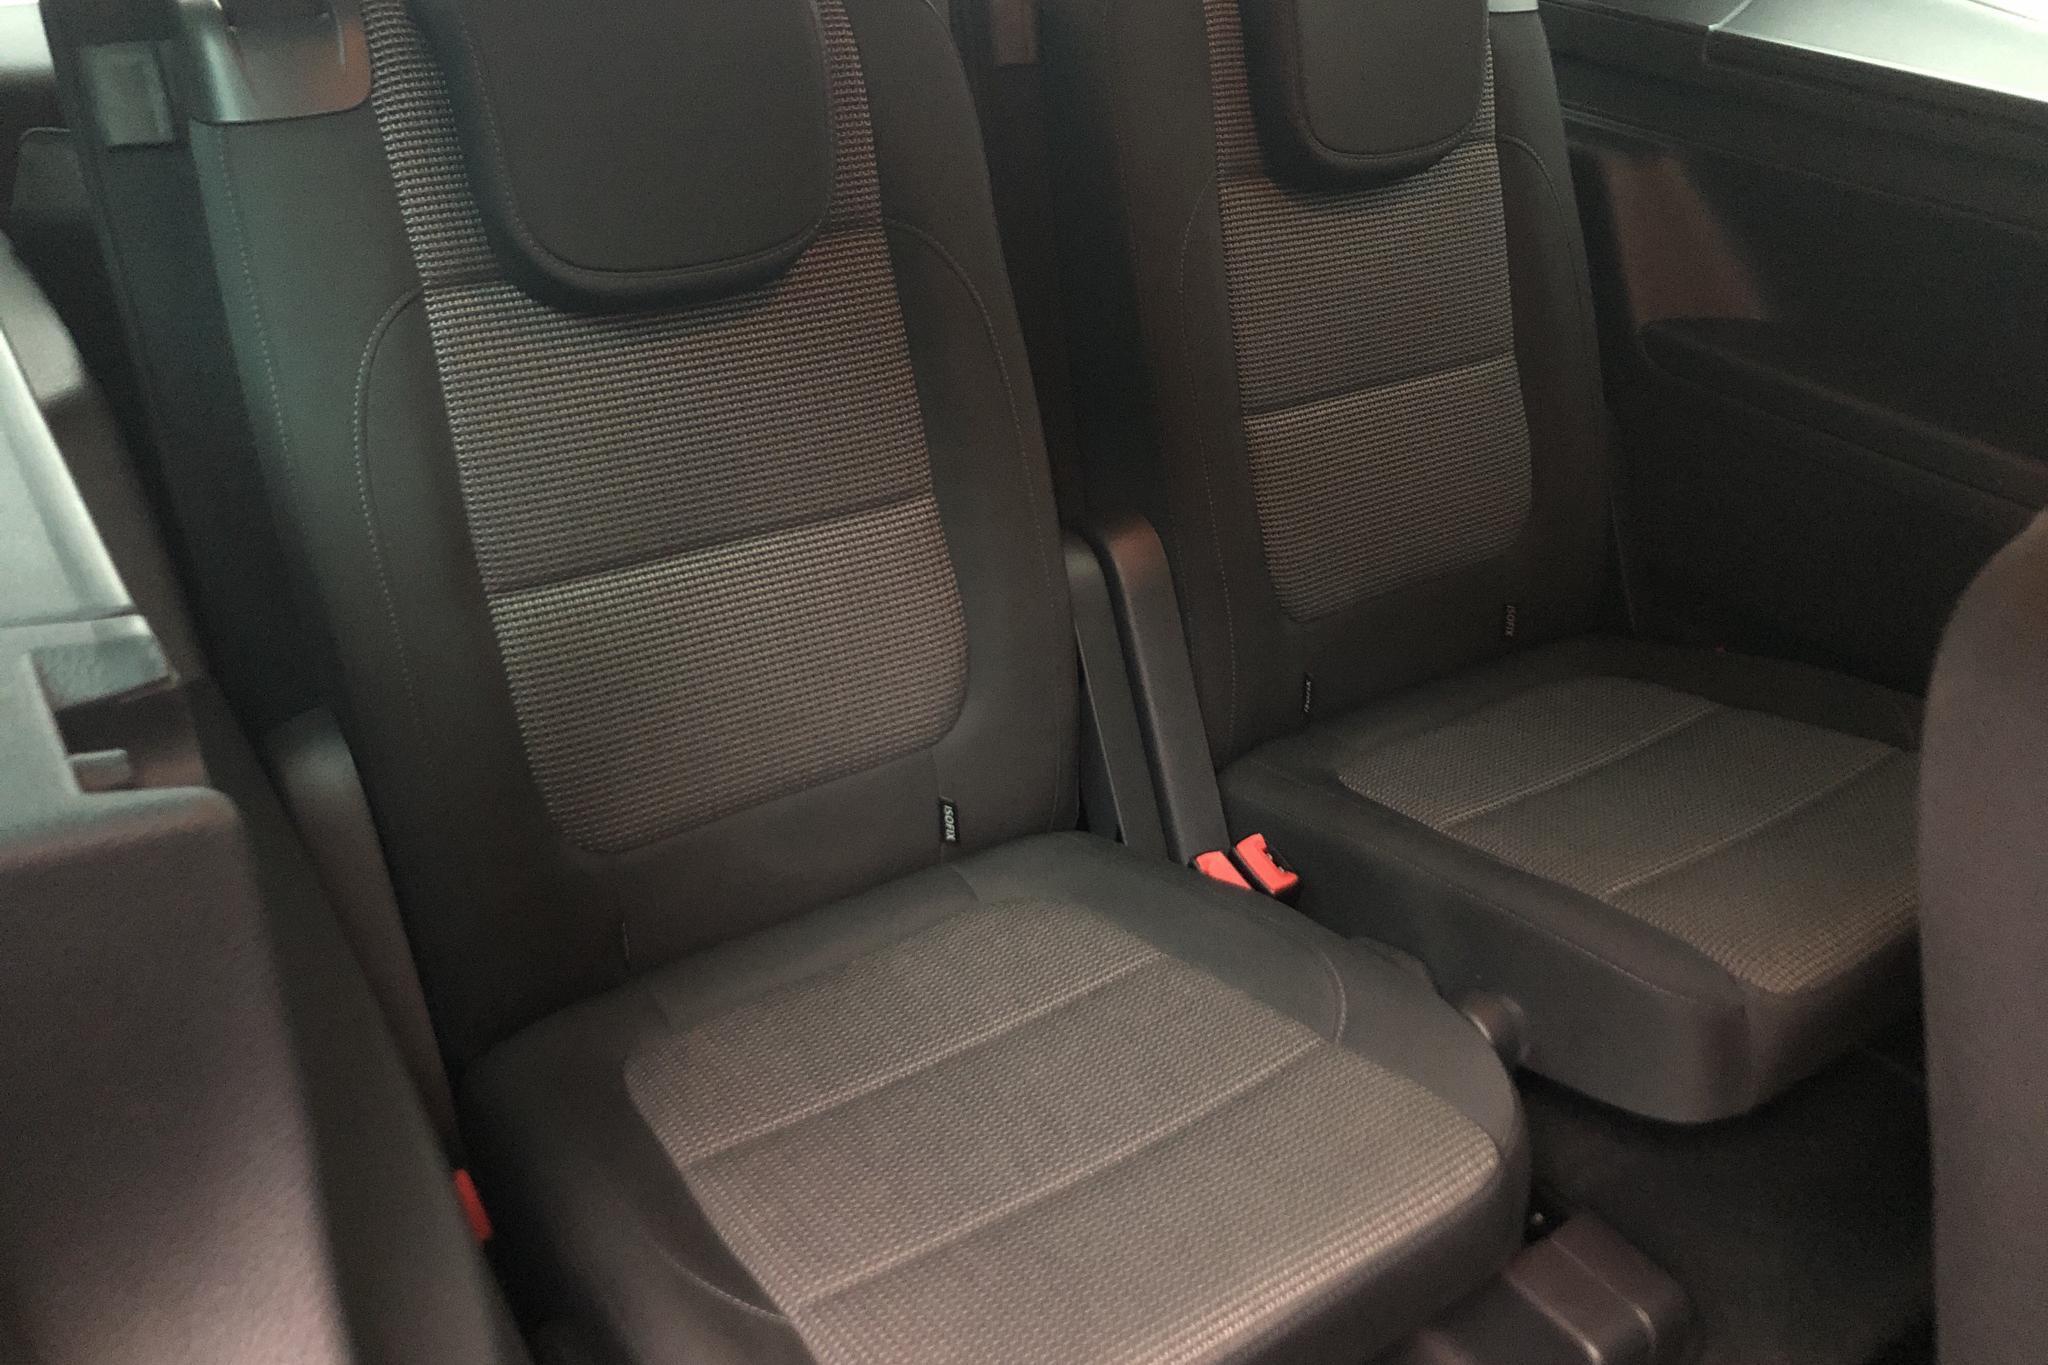 VW Sharan 2.0 TDI BlueMotion Technology 4motion (140hk) - 12 030 mil - Manuell - silver - 2014